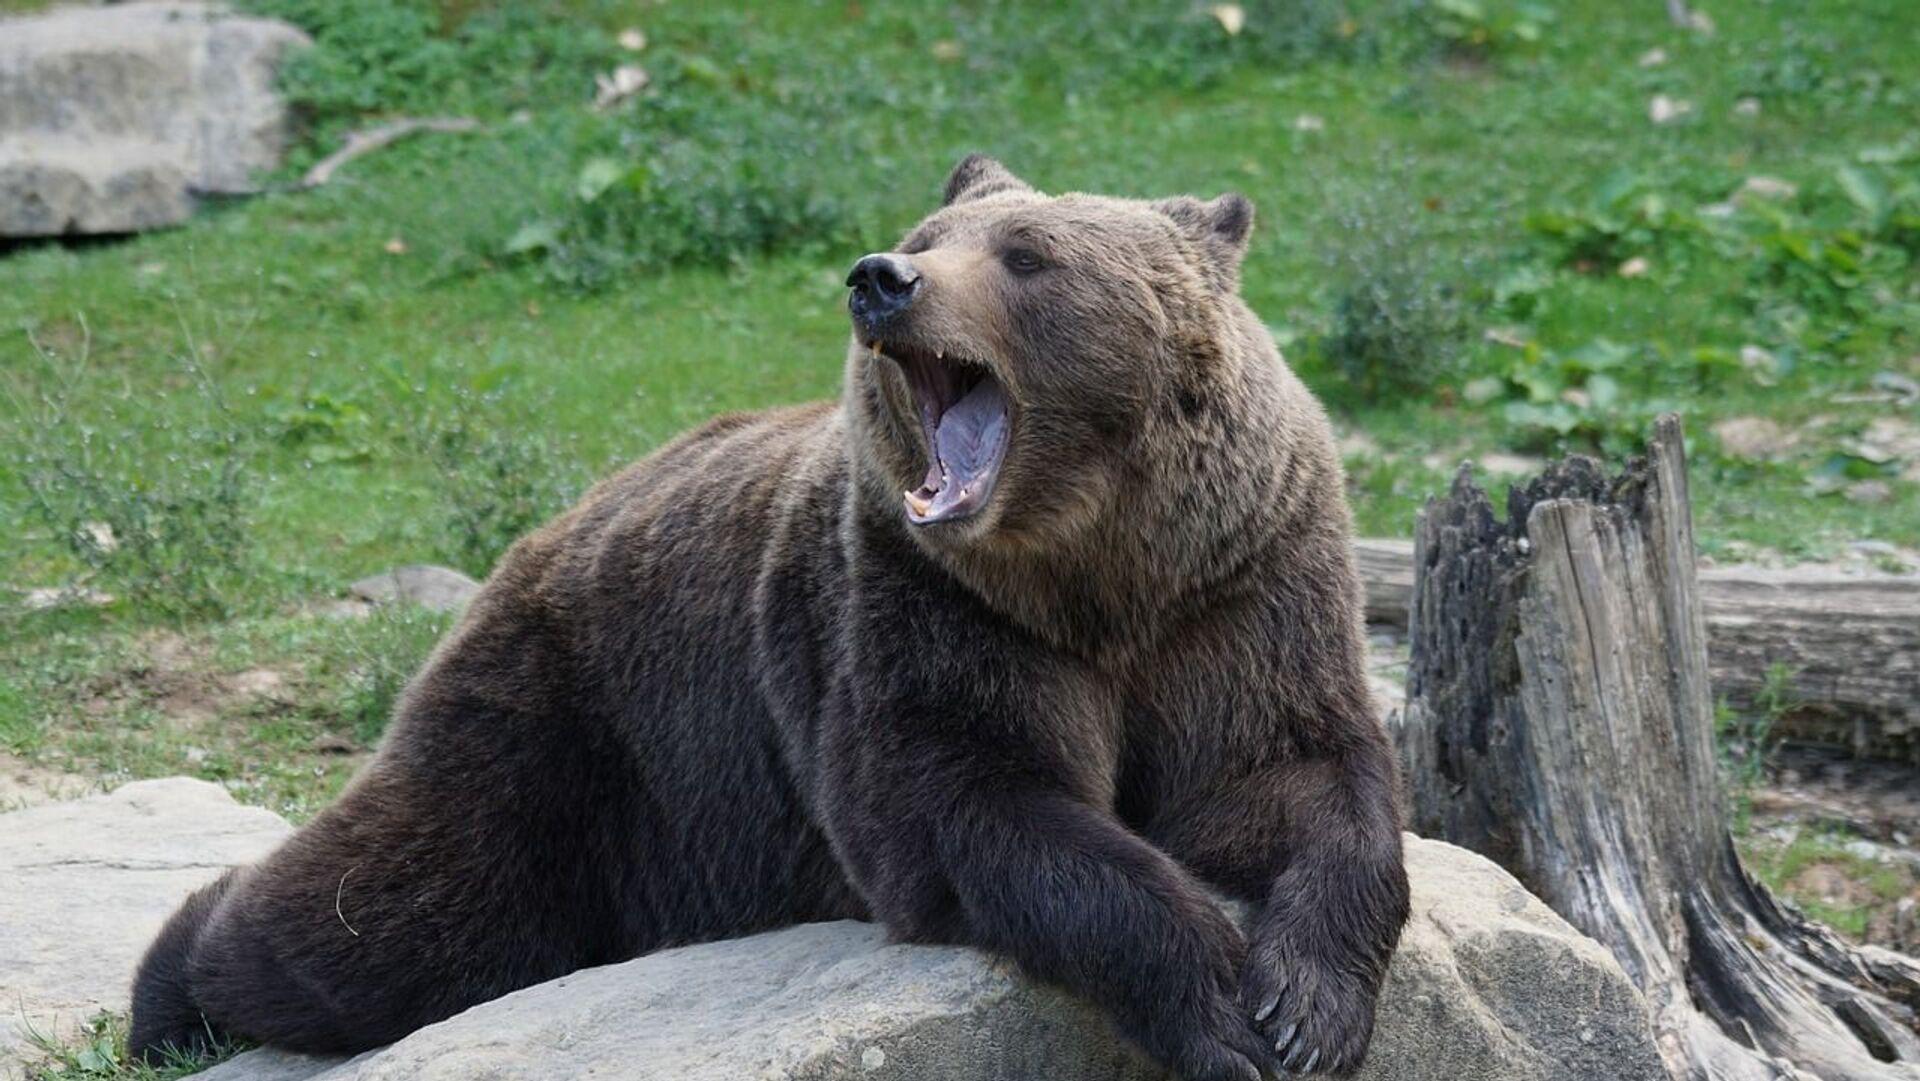 Un oso, referencial - Sputnik Mundo, 1920, 09.05.2021